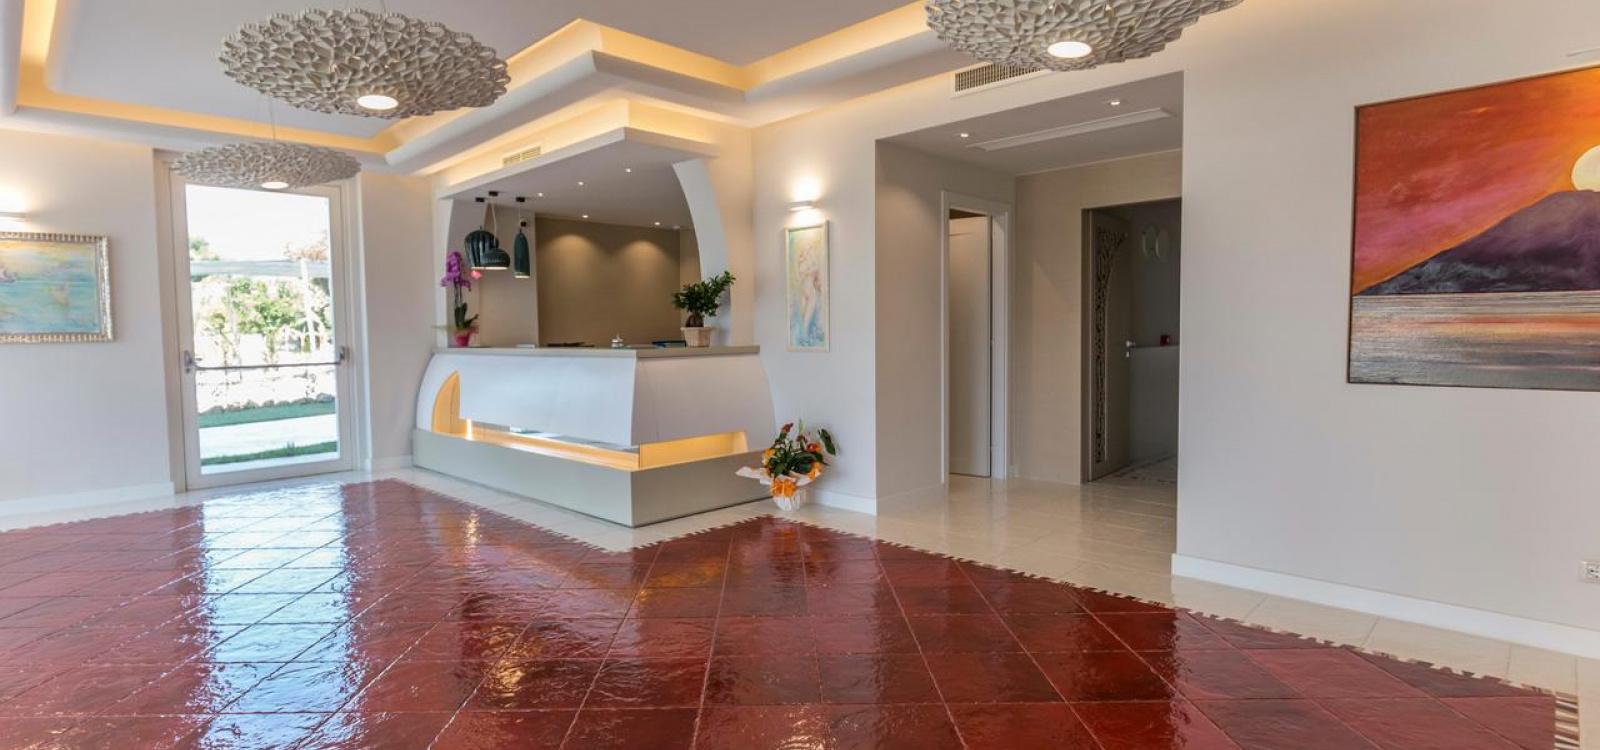 Hall hotel suite l'Oasi di Riaci